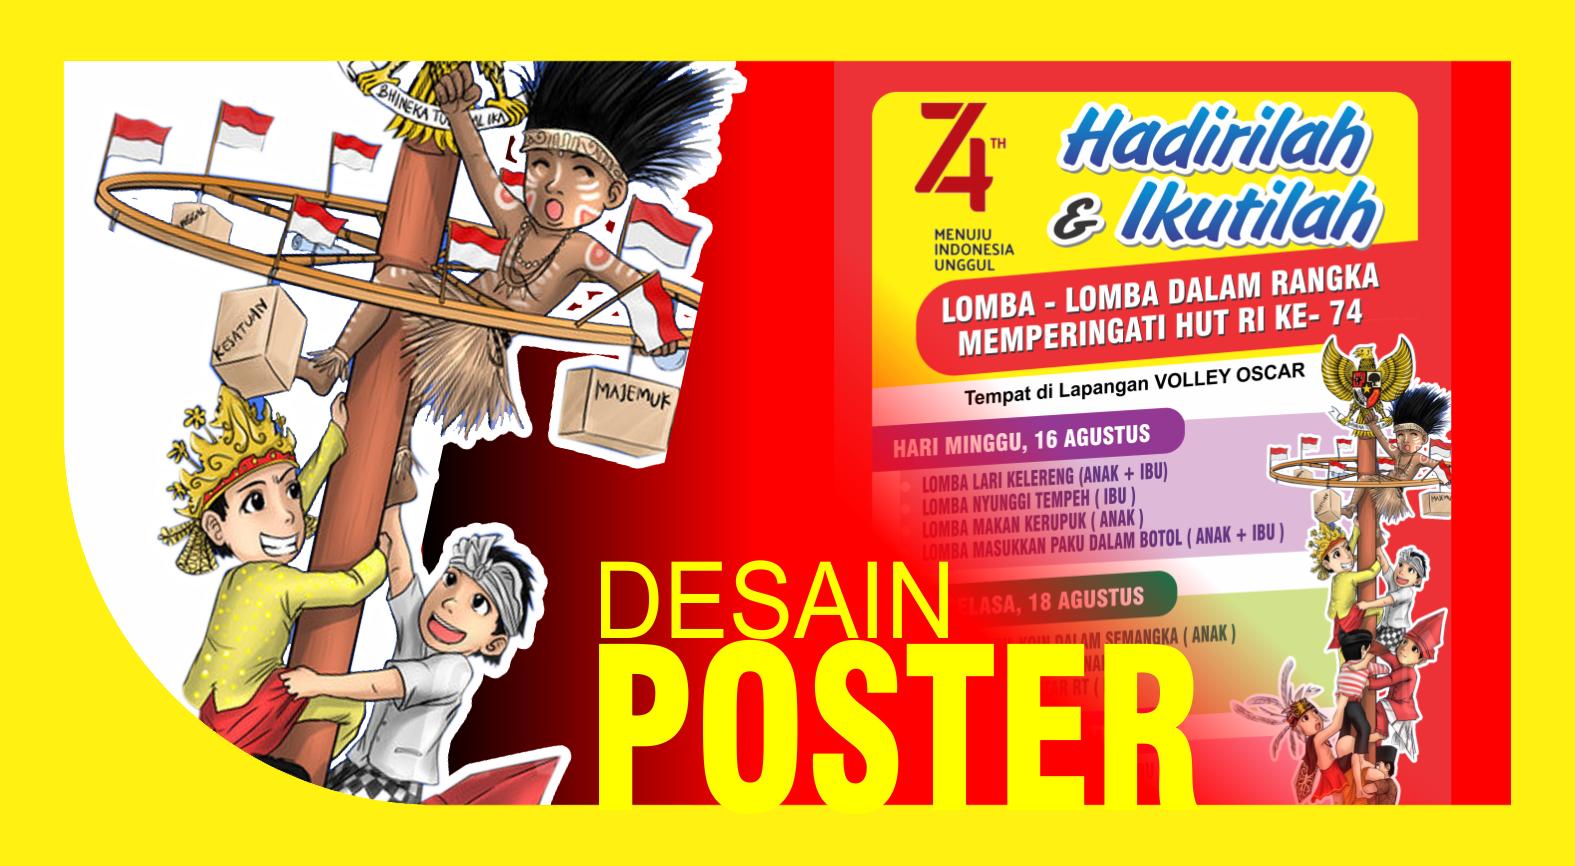 Desain Poster Baner Agustusan Poster Desain Poster Desain